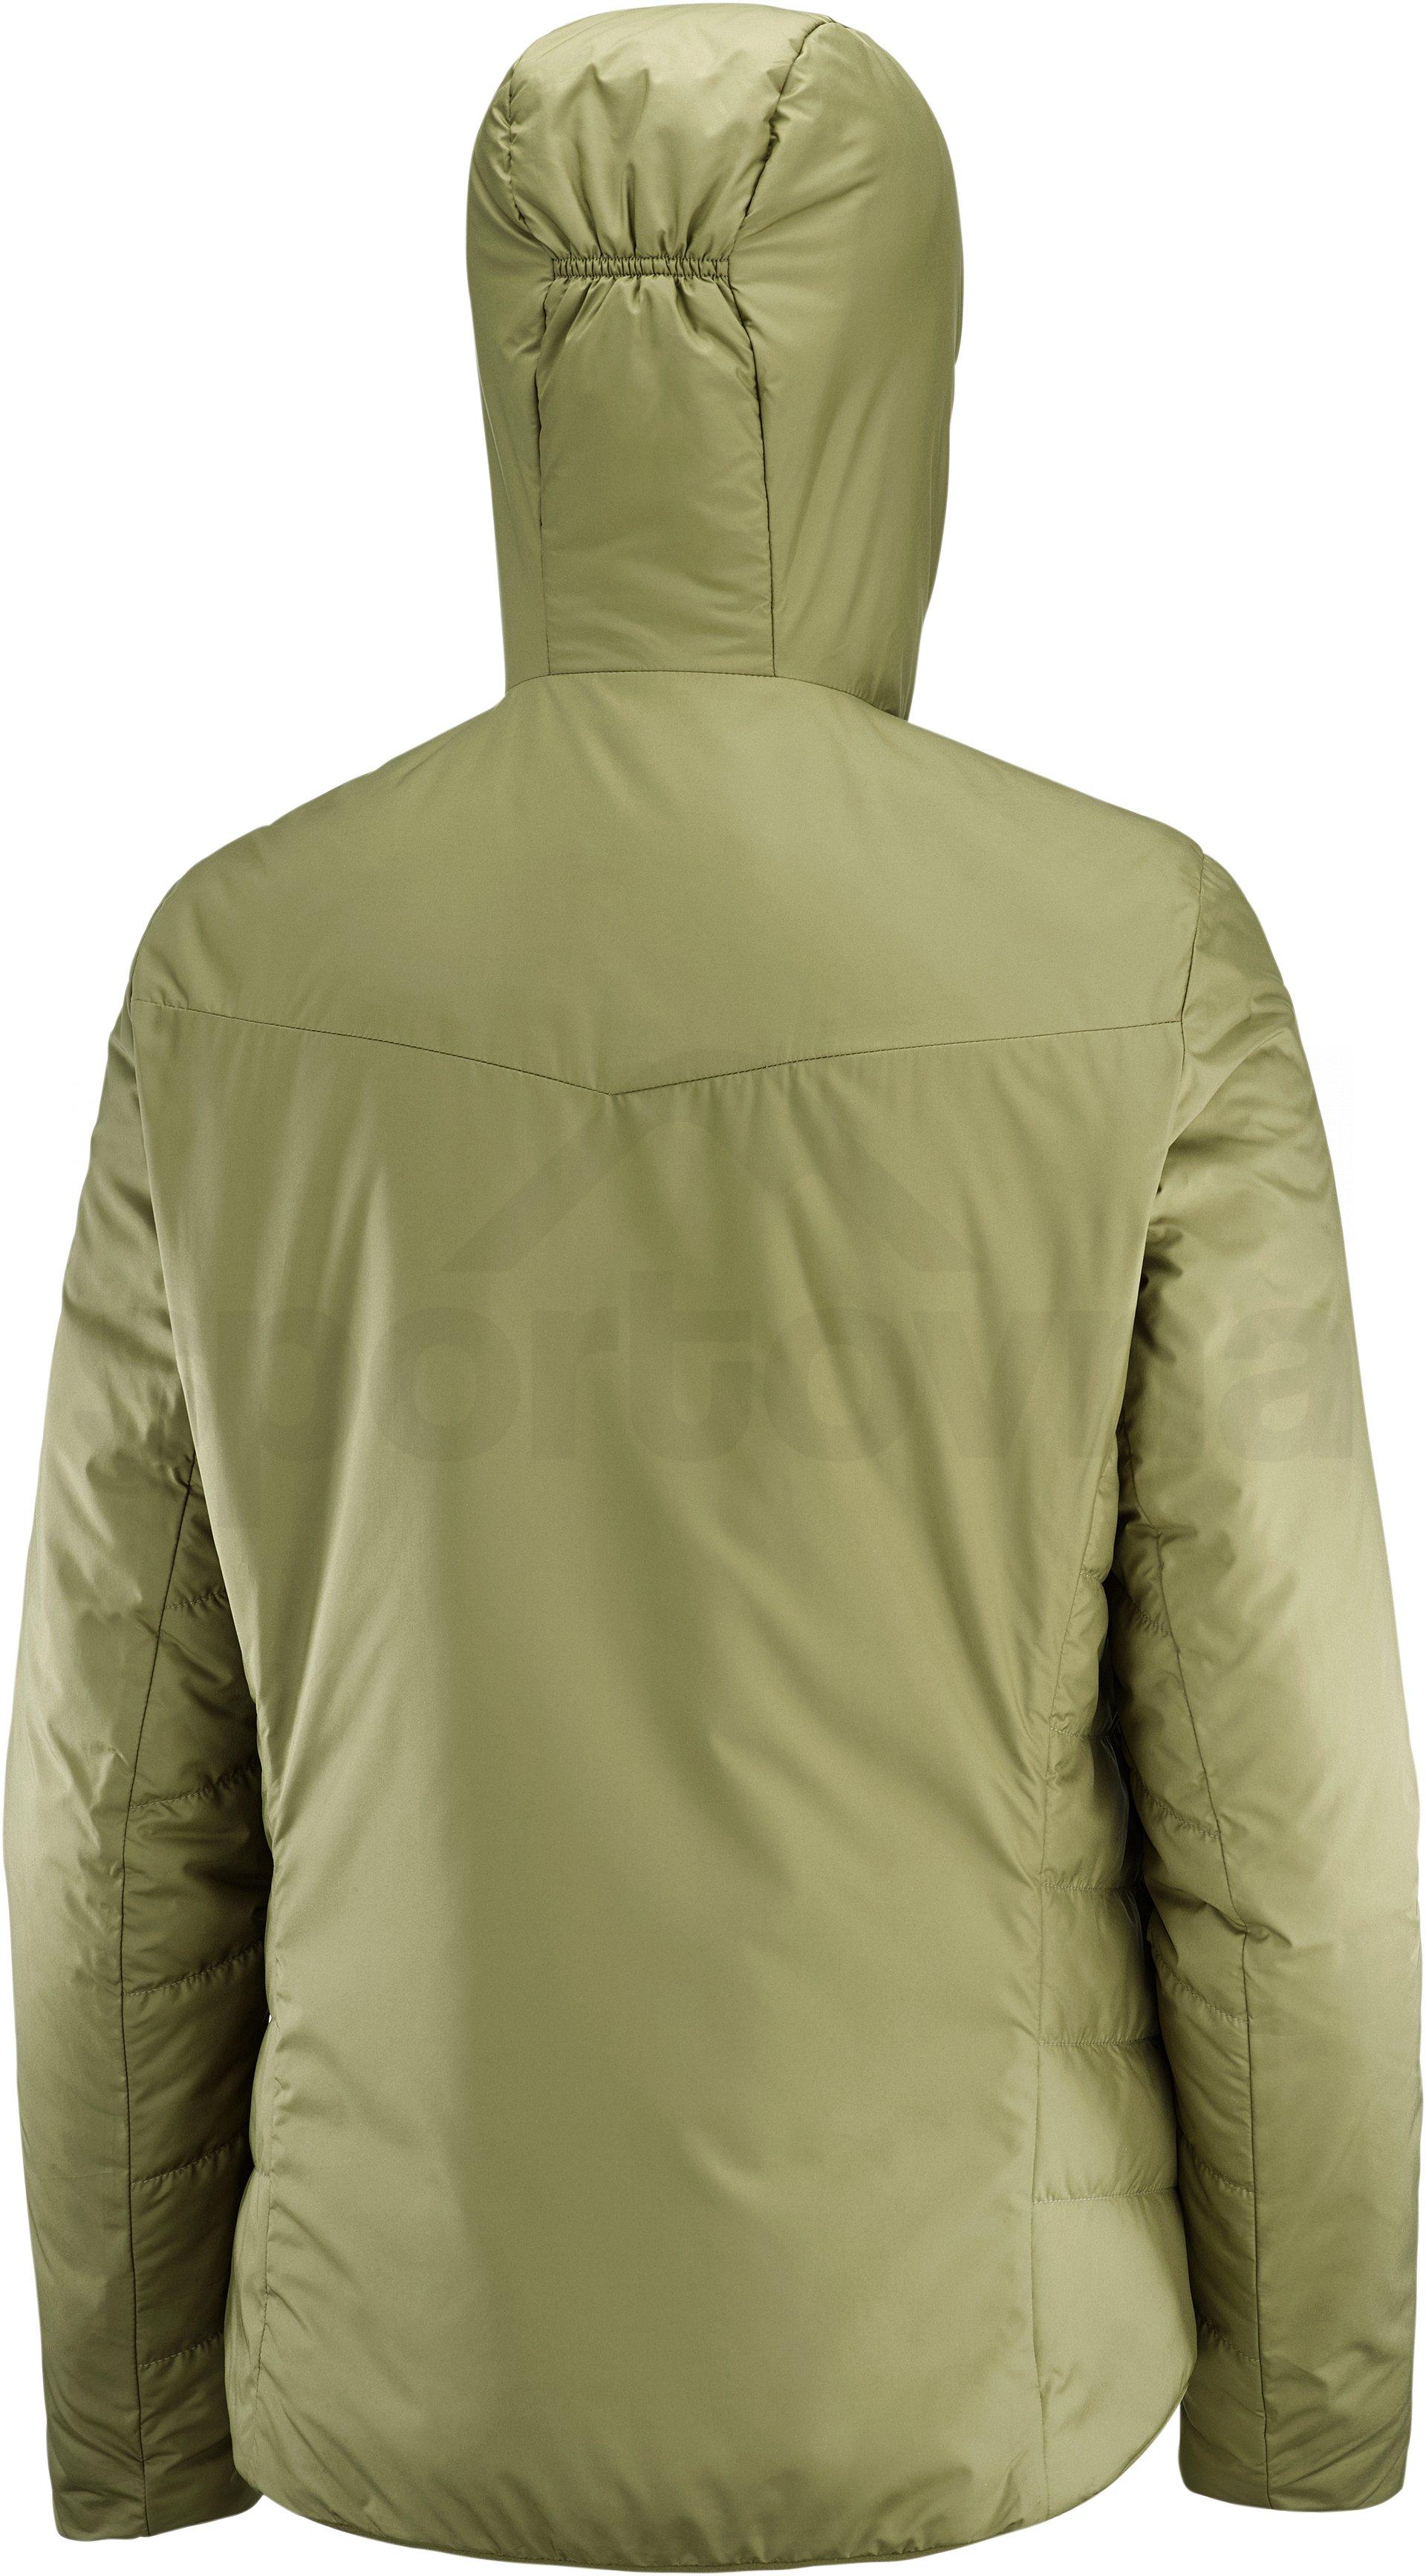 Bunda Salomon Outrack Insulated Hoodie W - zelená